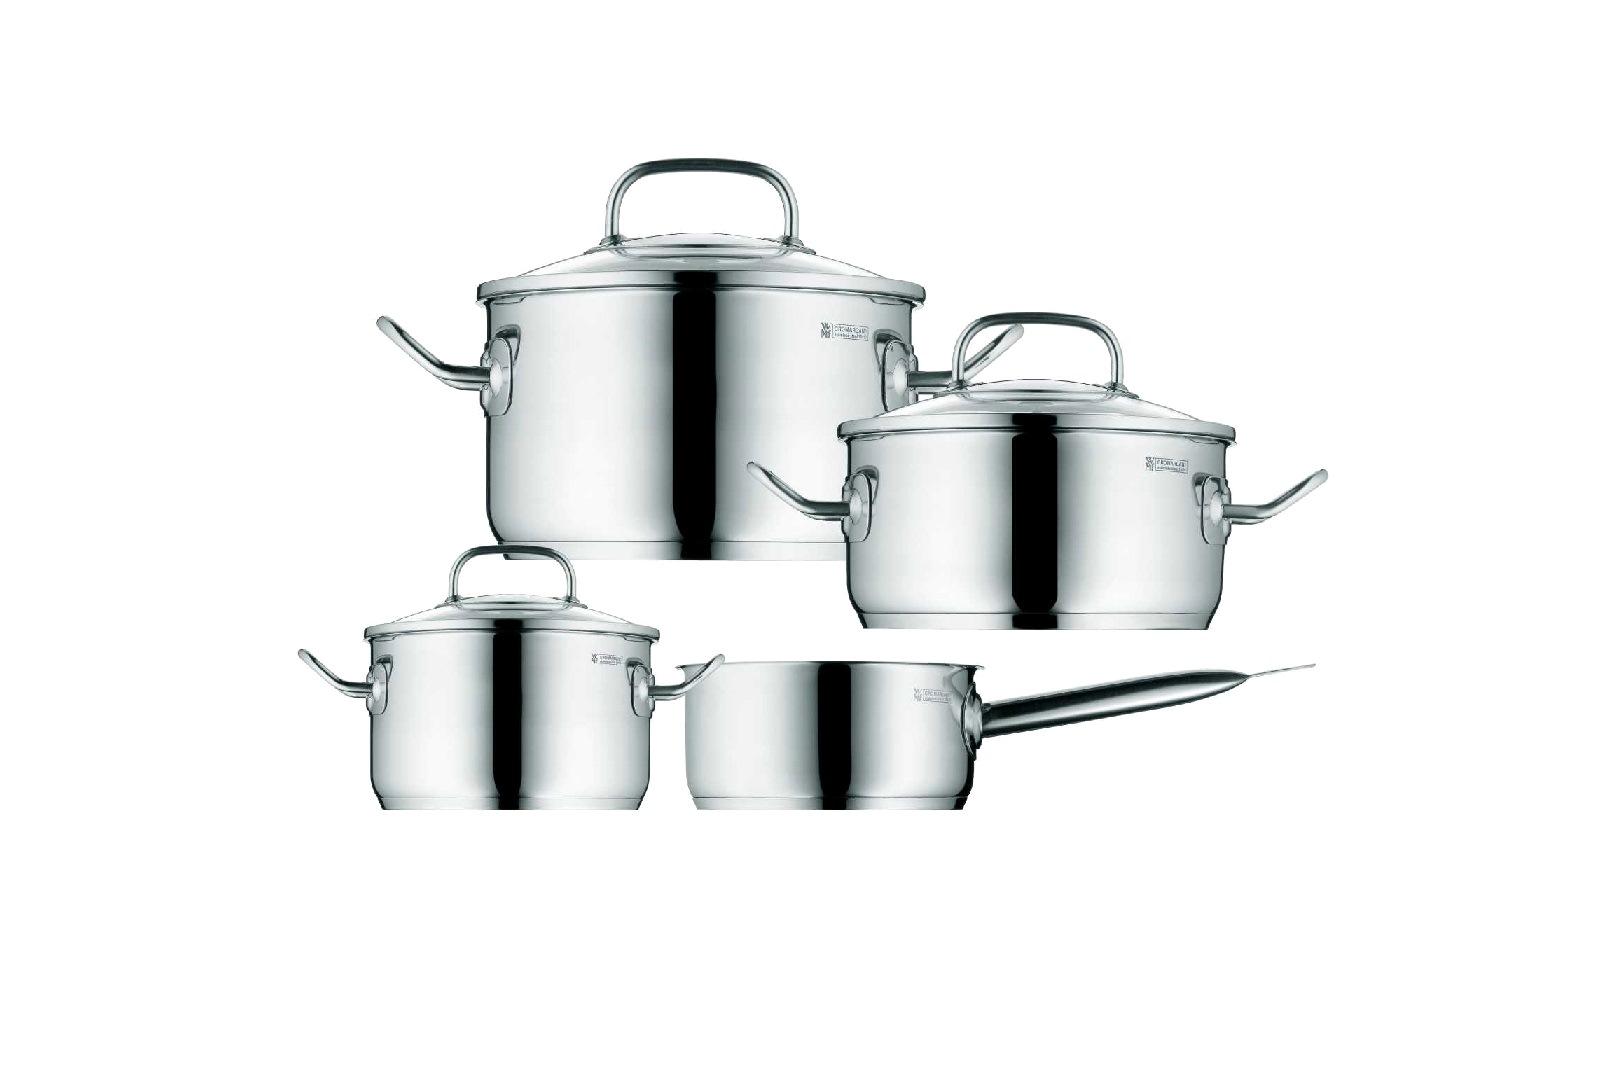 Набор кухонной посуды WMF PROFI PLUS, серебристый, 4 предмета WMF 07 1614 6380 PROMO фото 1